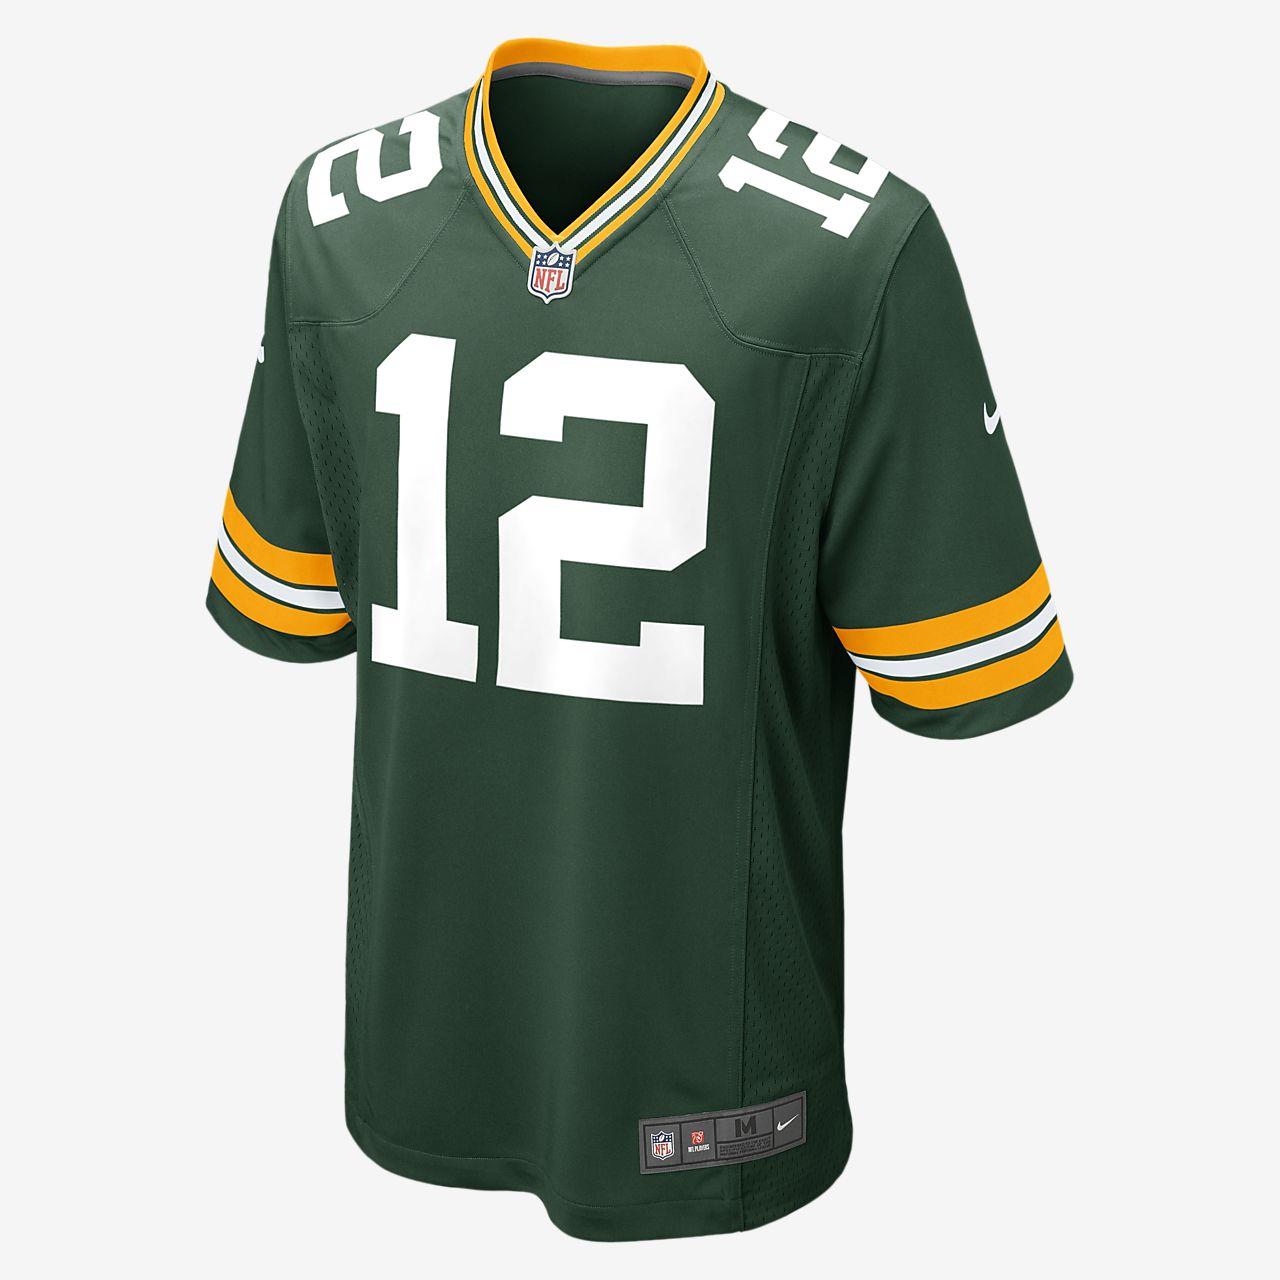 Camiseta oficial de fútbol americano de local para hombre de NFL Green Bay Packers (Aaron Rodgers)